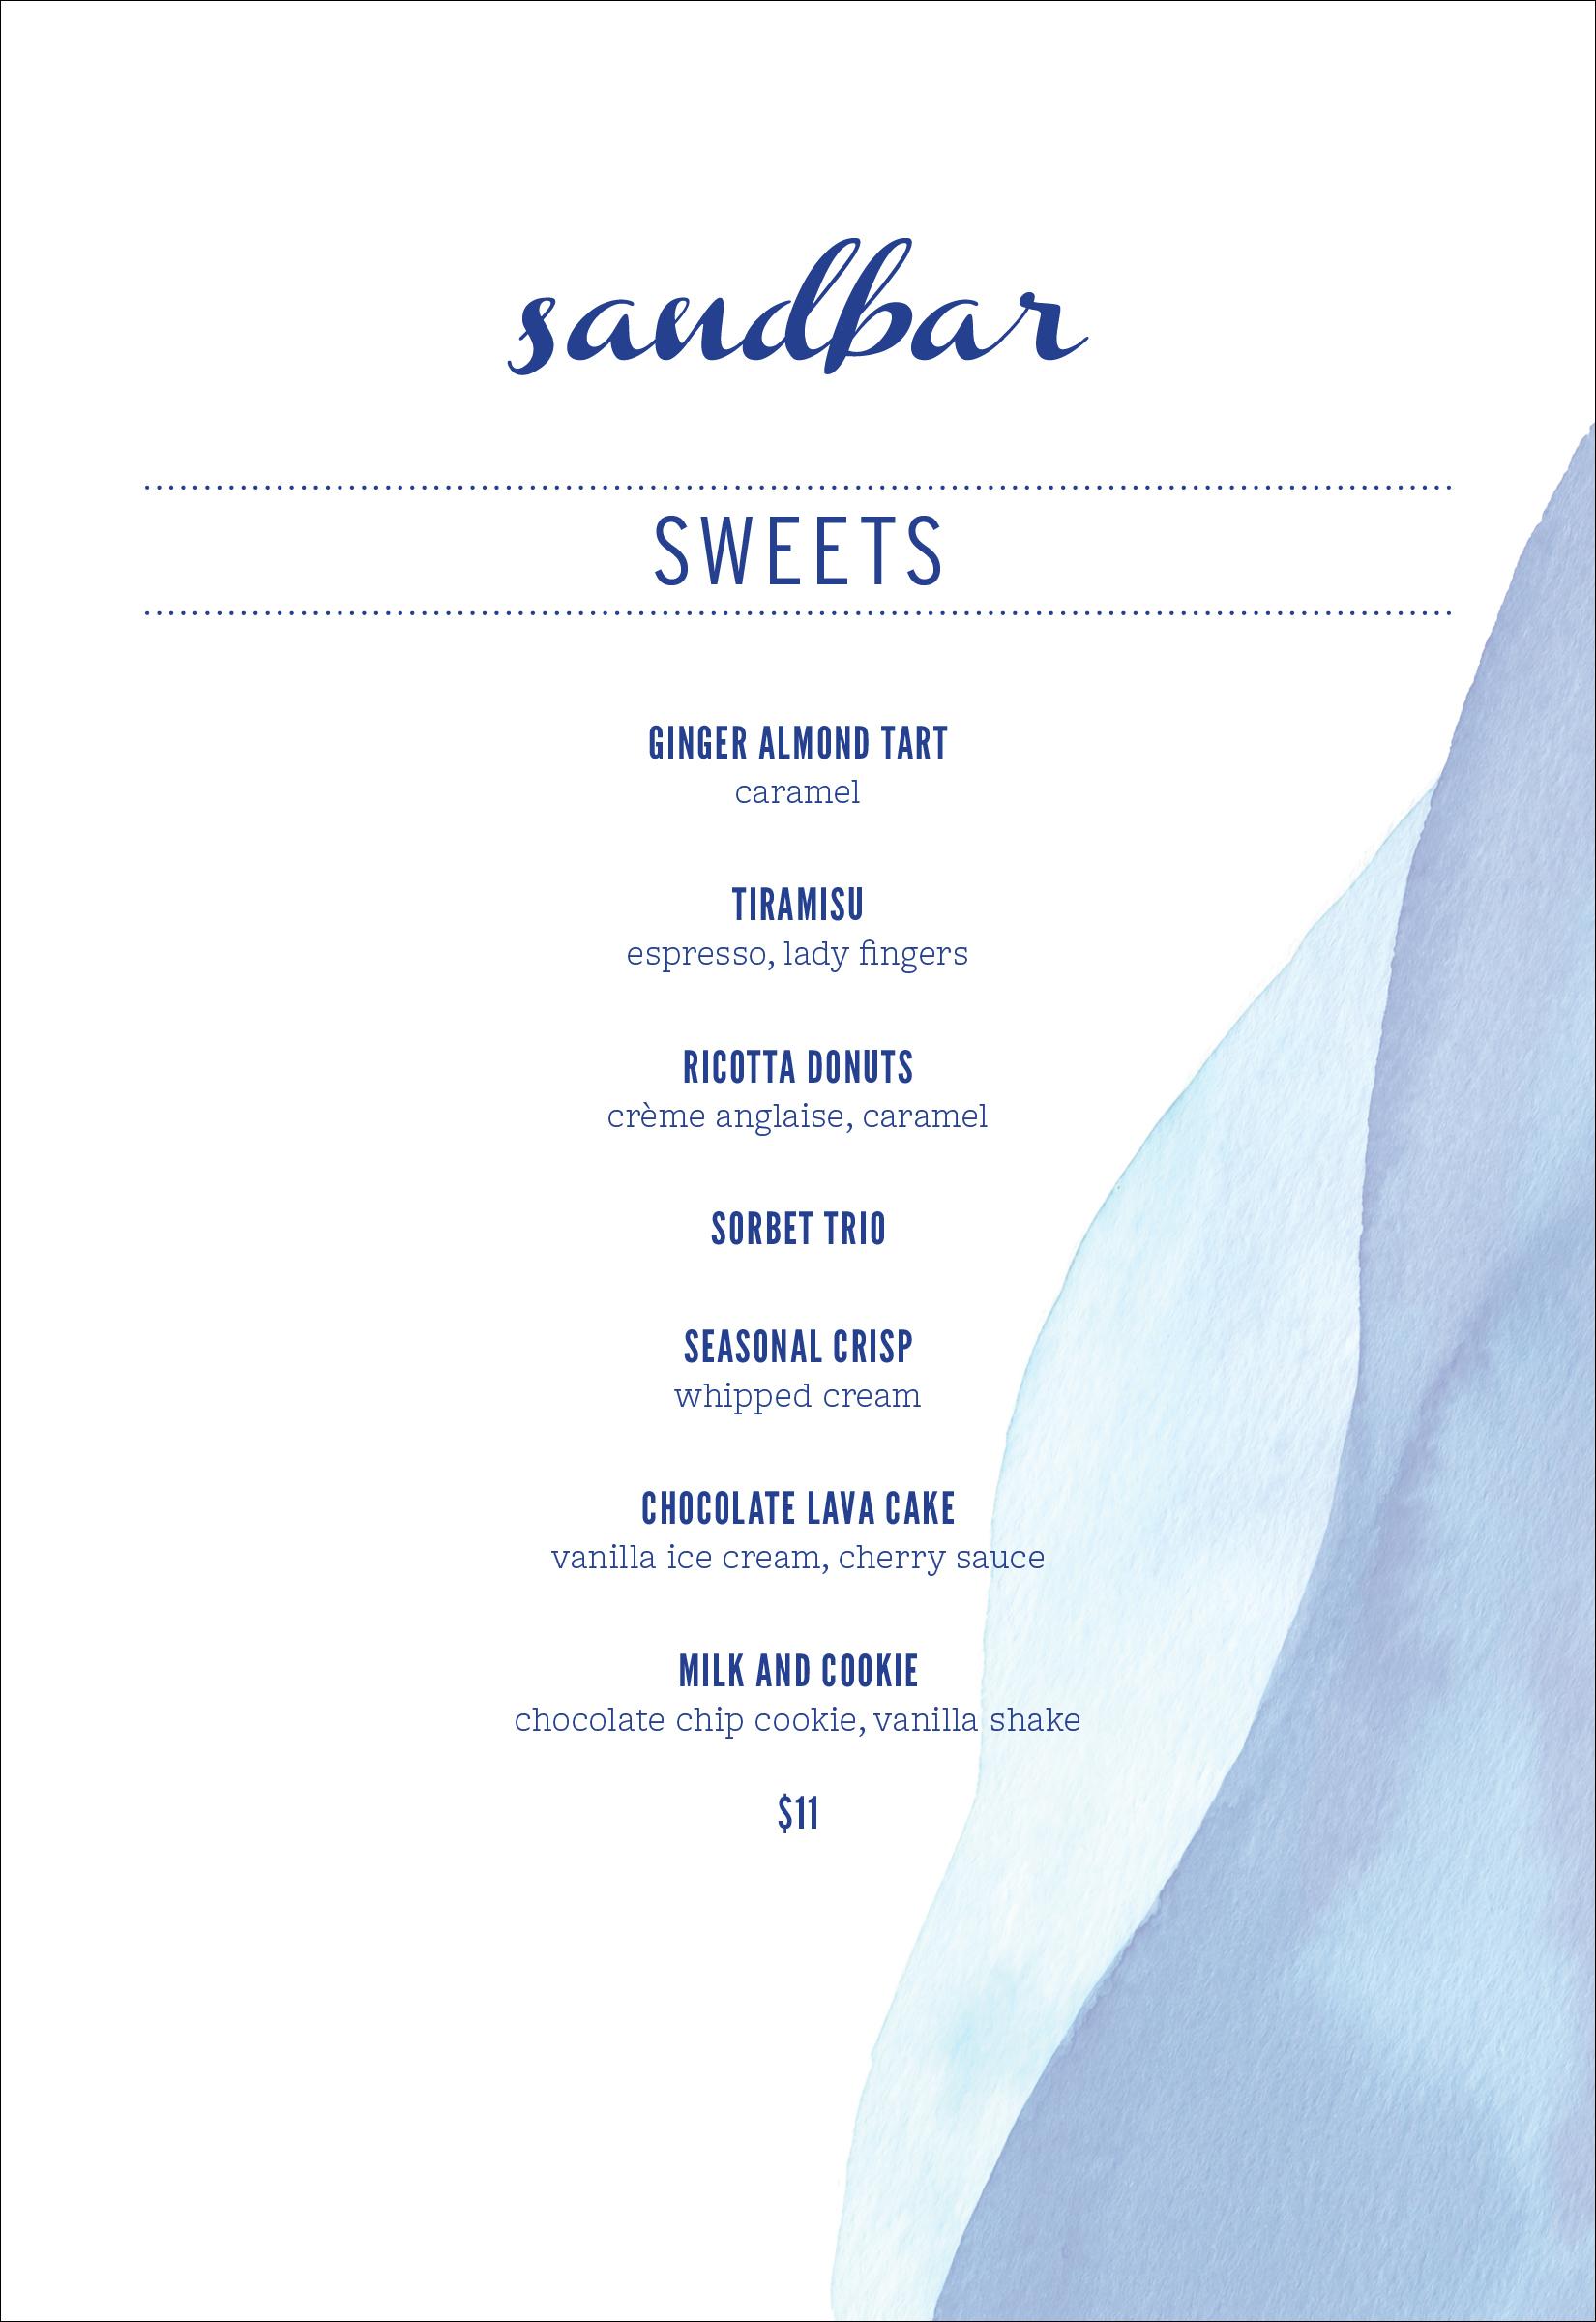 Sandbar_Sweets.jpg